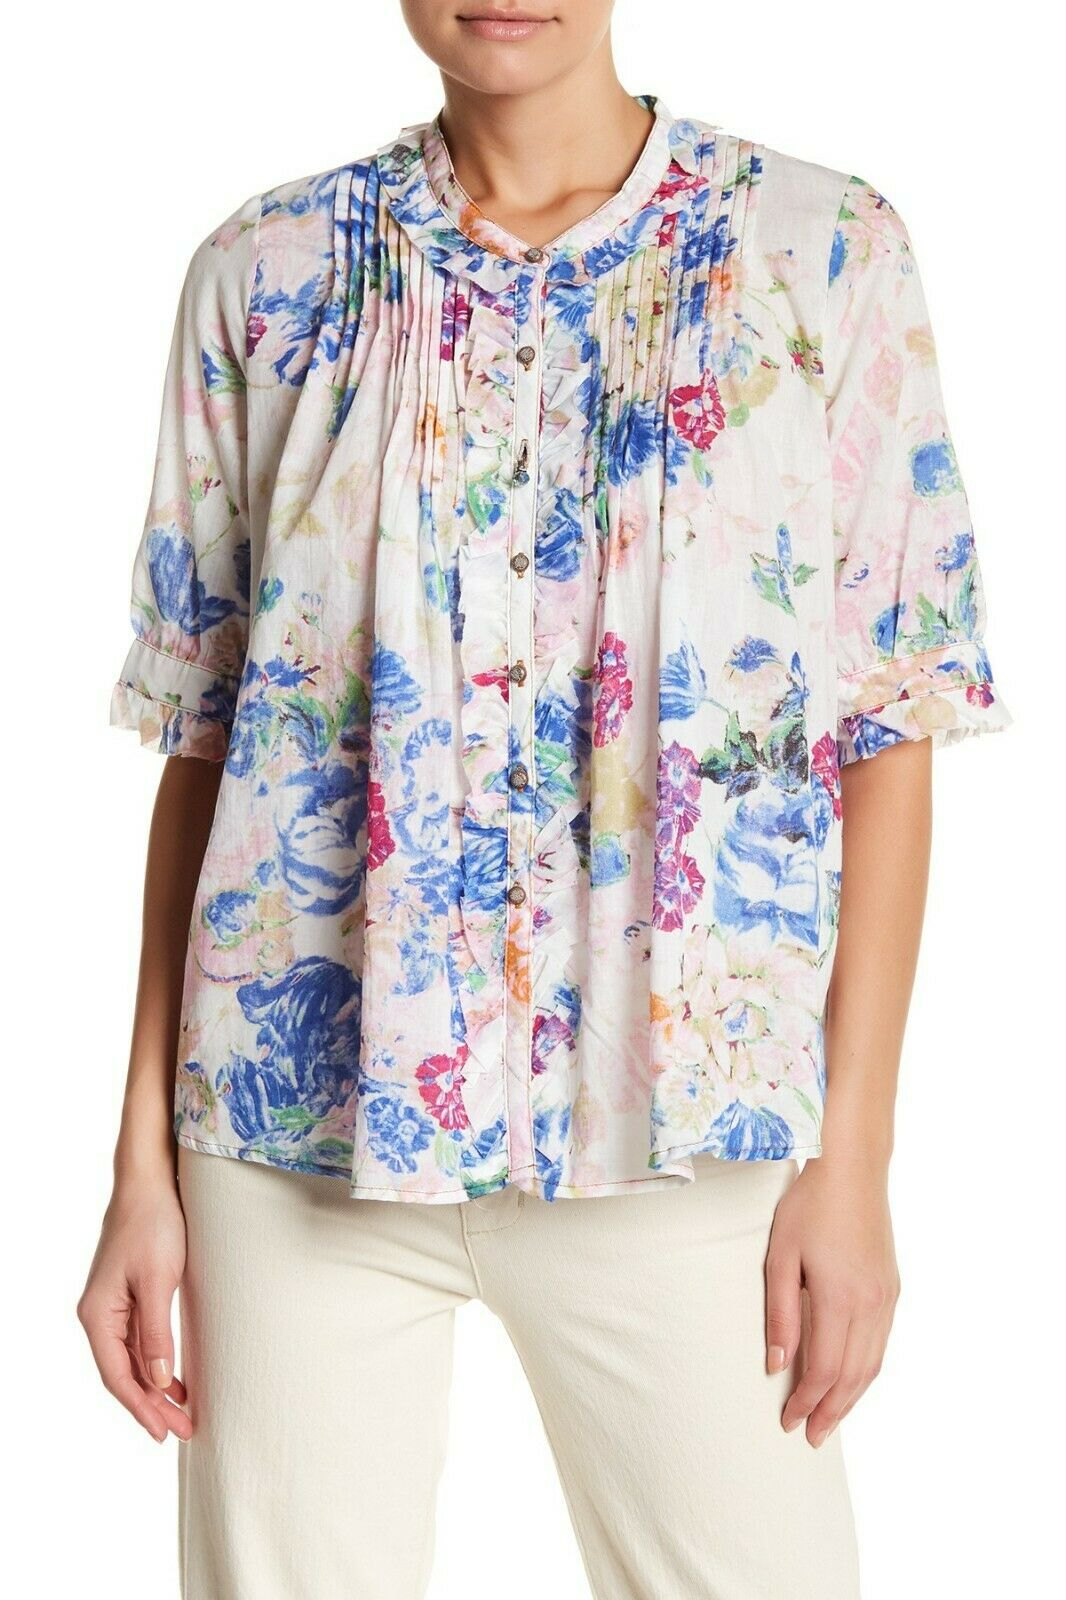 ARATTA Maya Pleated Ruffled Mixed Floral Print Weiß Cotton Top Blouse Größe M